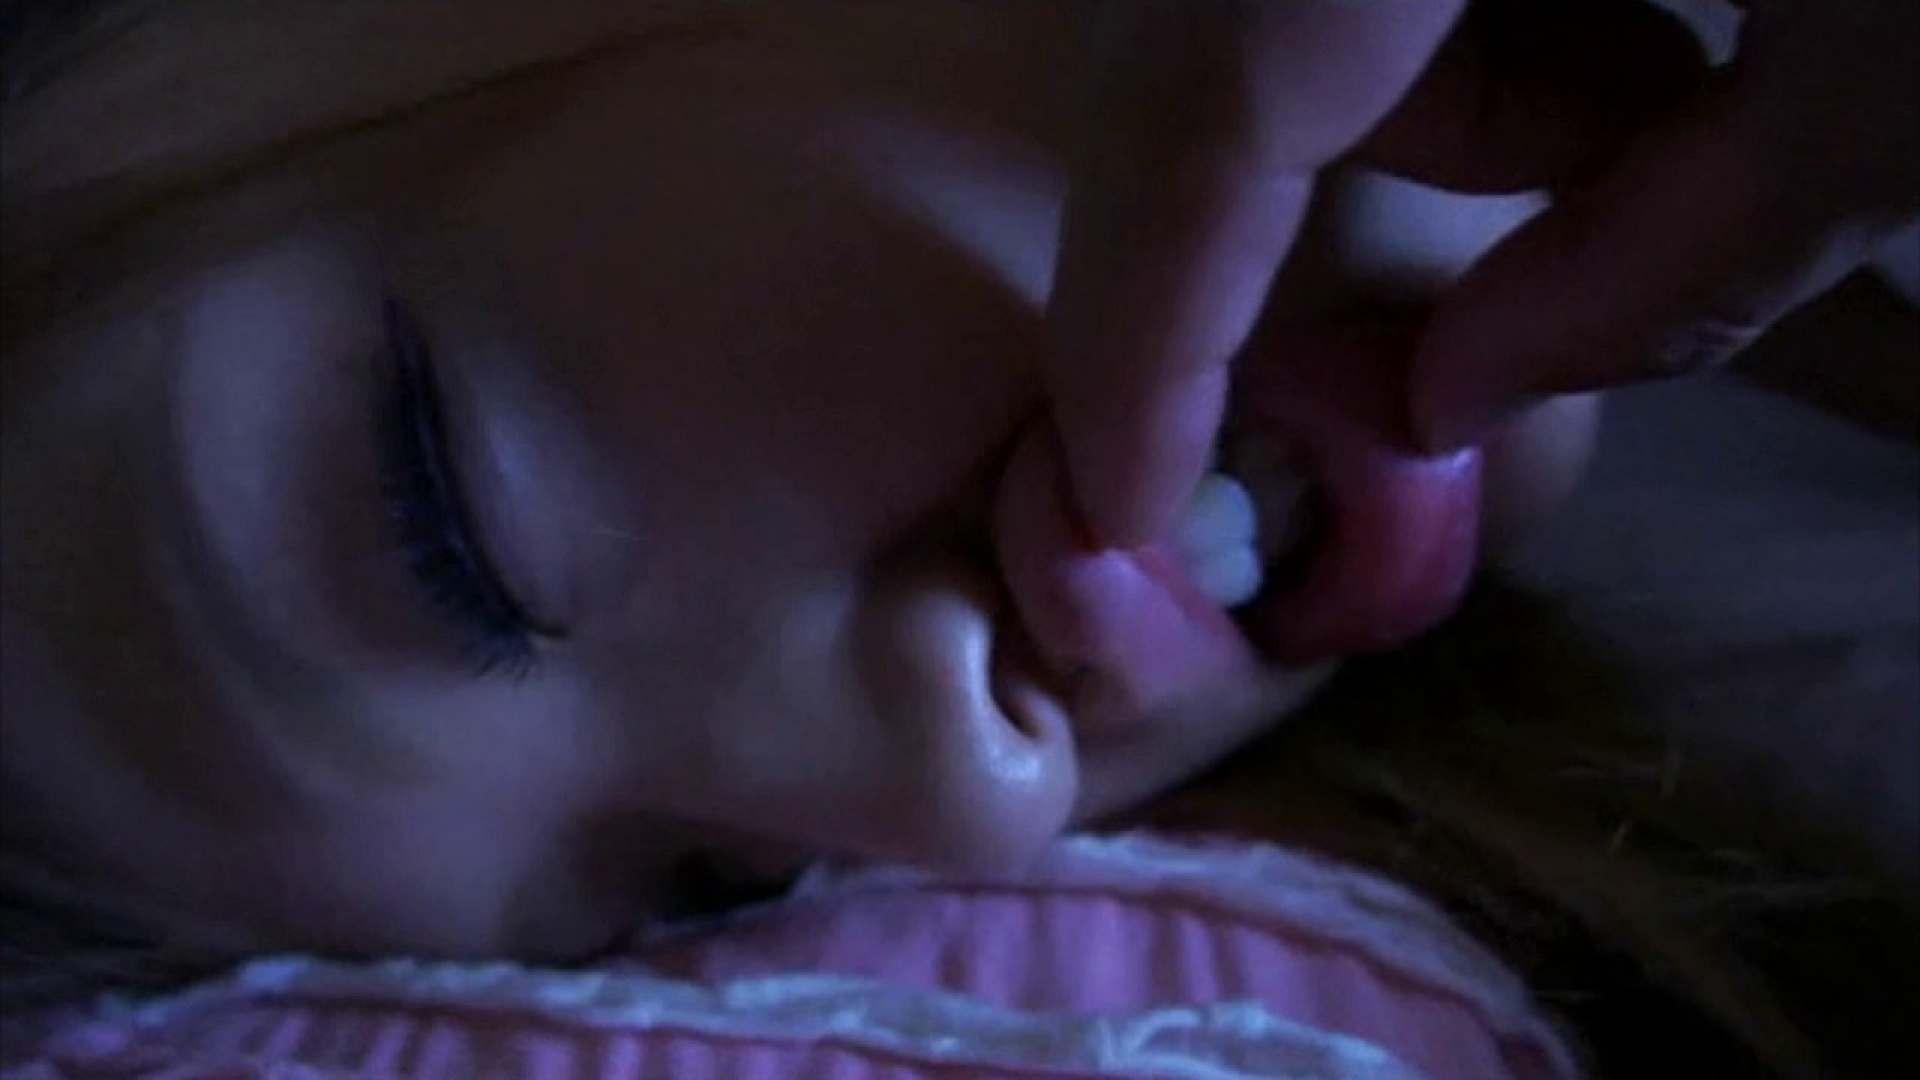 vol.5 ー前編ーユリナちゃんの身体を隅々まで観察しました。 ギャル攻め ぱこり動画紹介 89画像 72